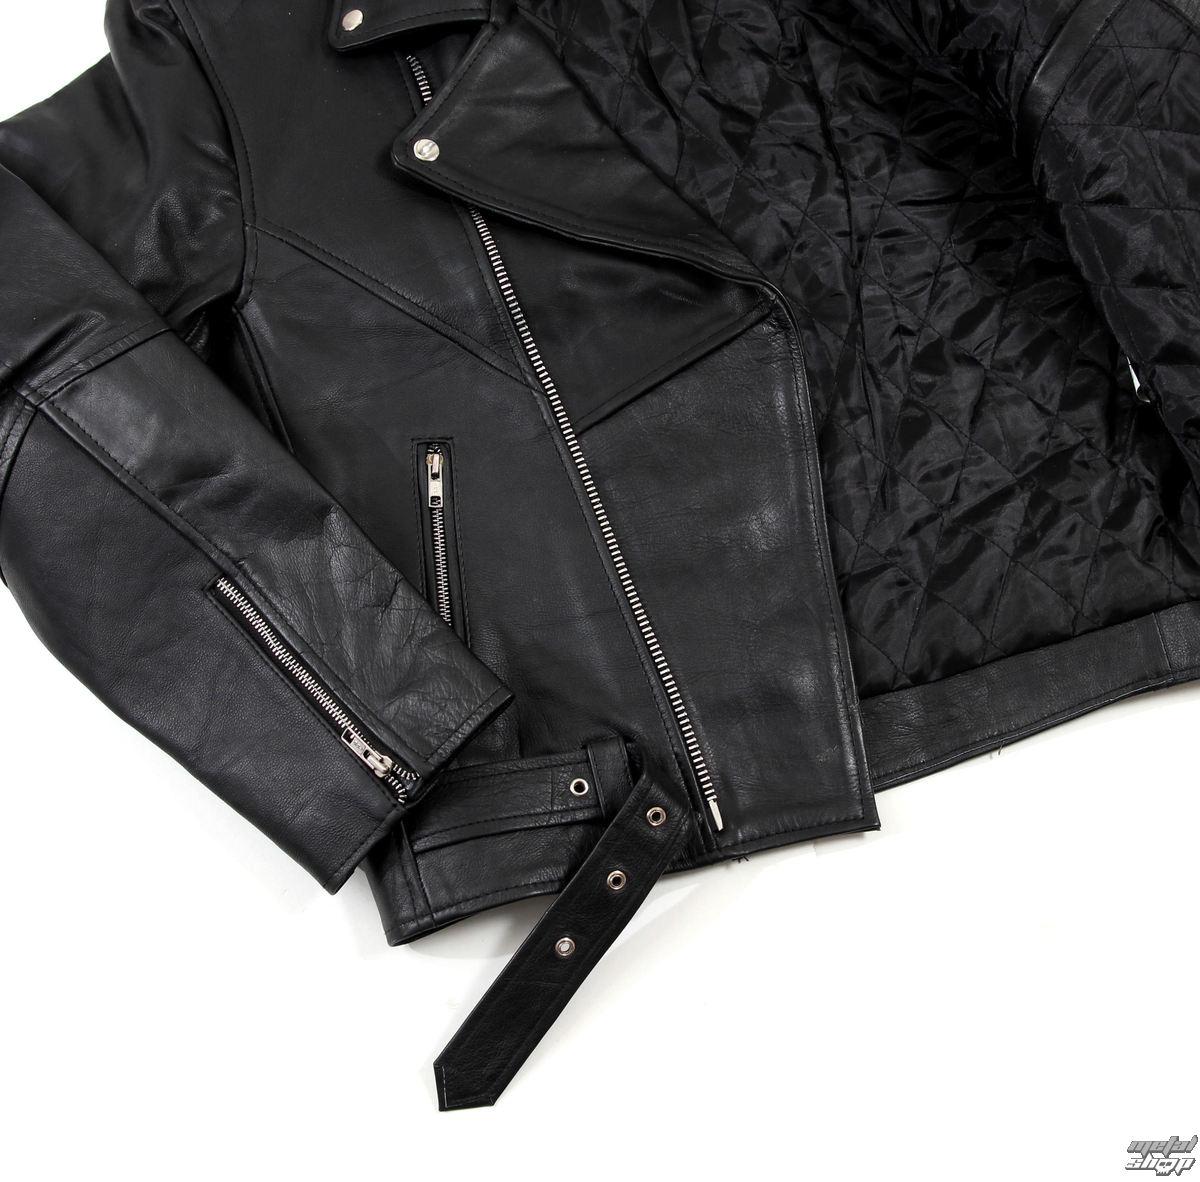 black+veil+brides+leather+jacket